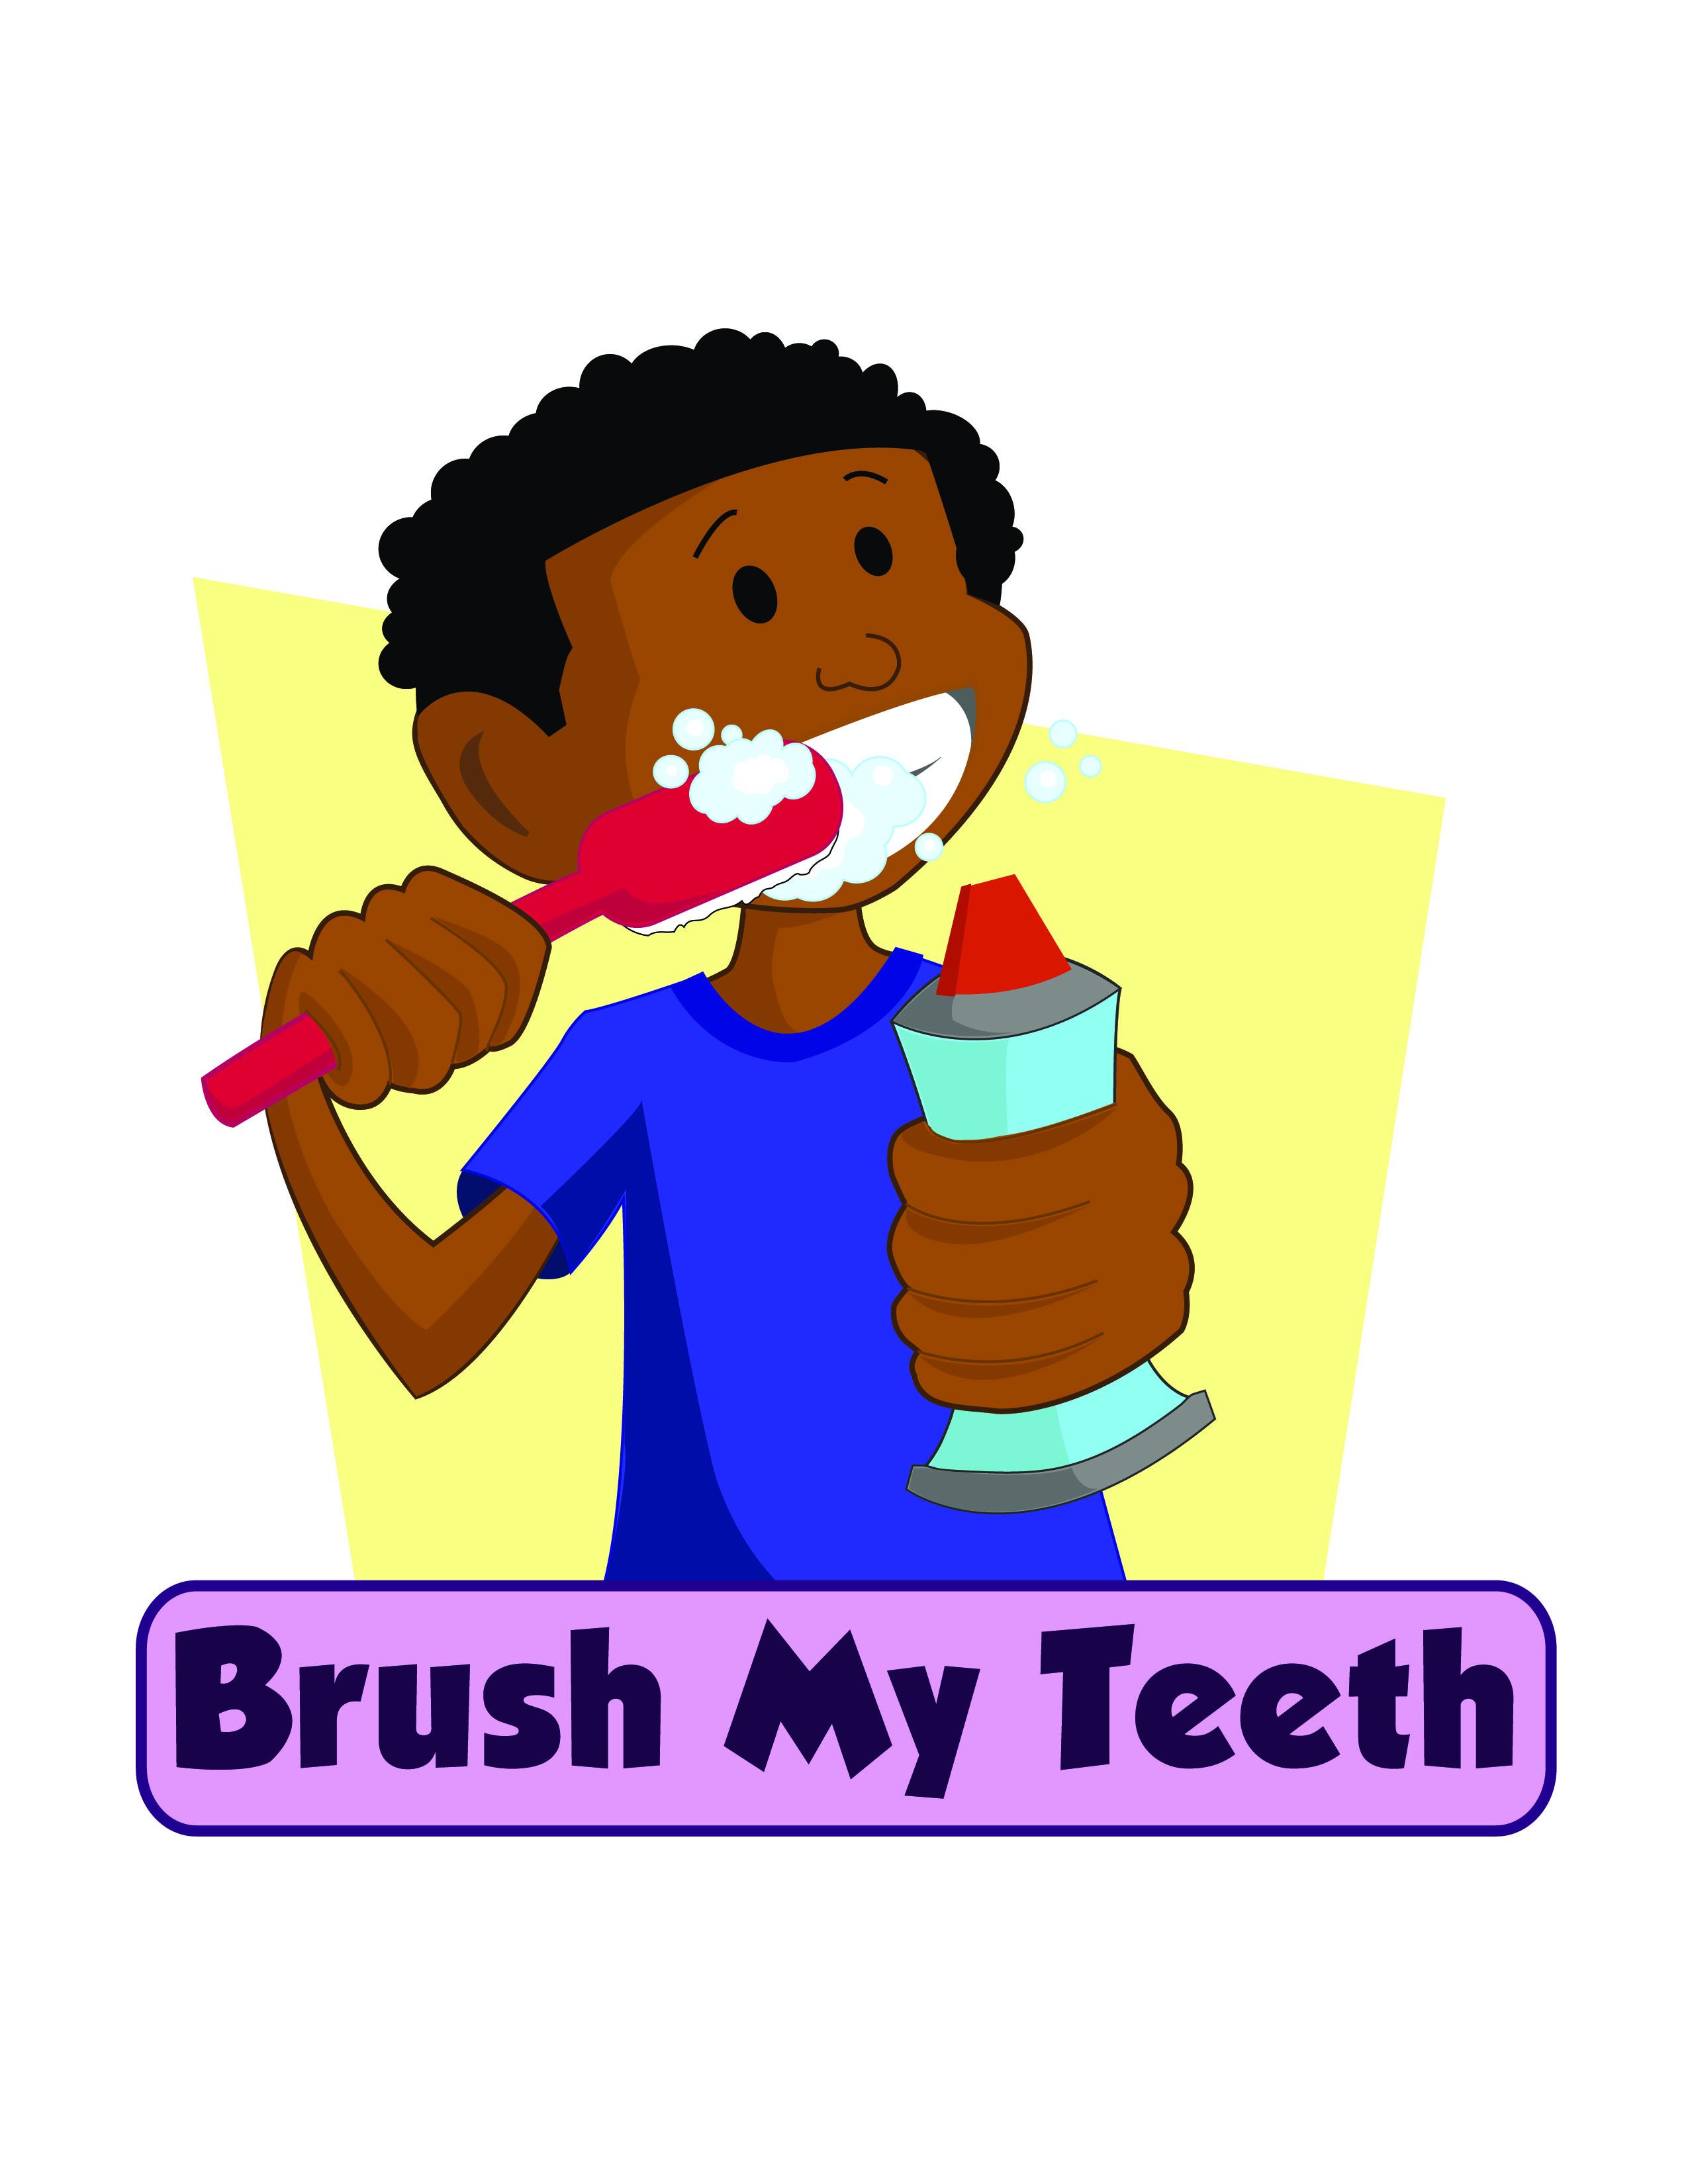 Brushing Teeth Clip Art N37 free image.